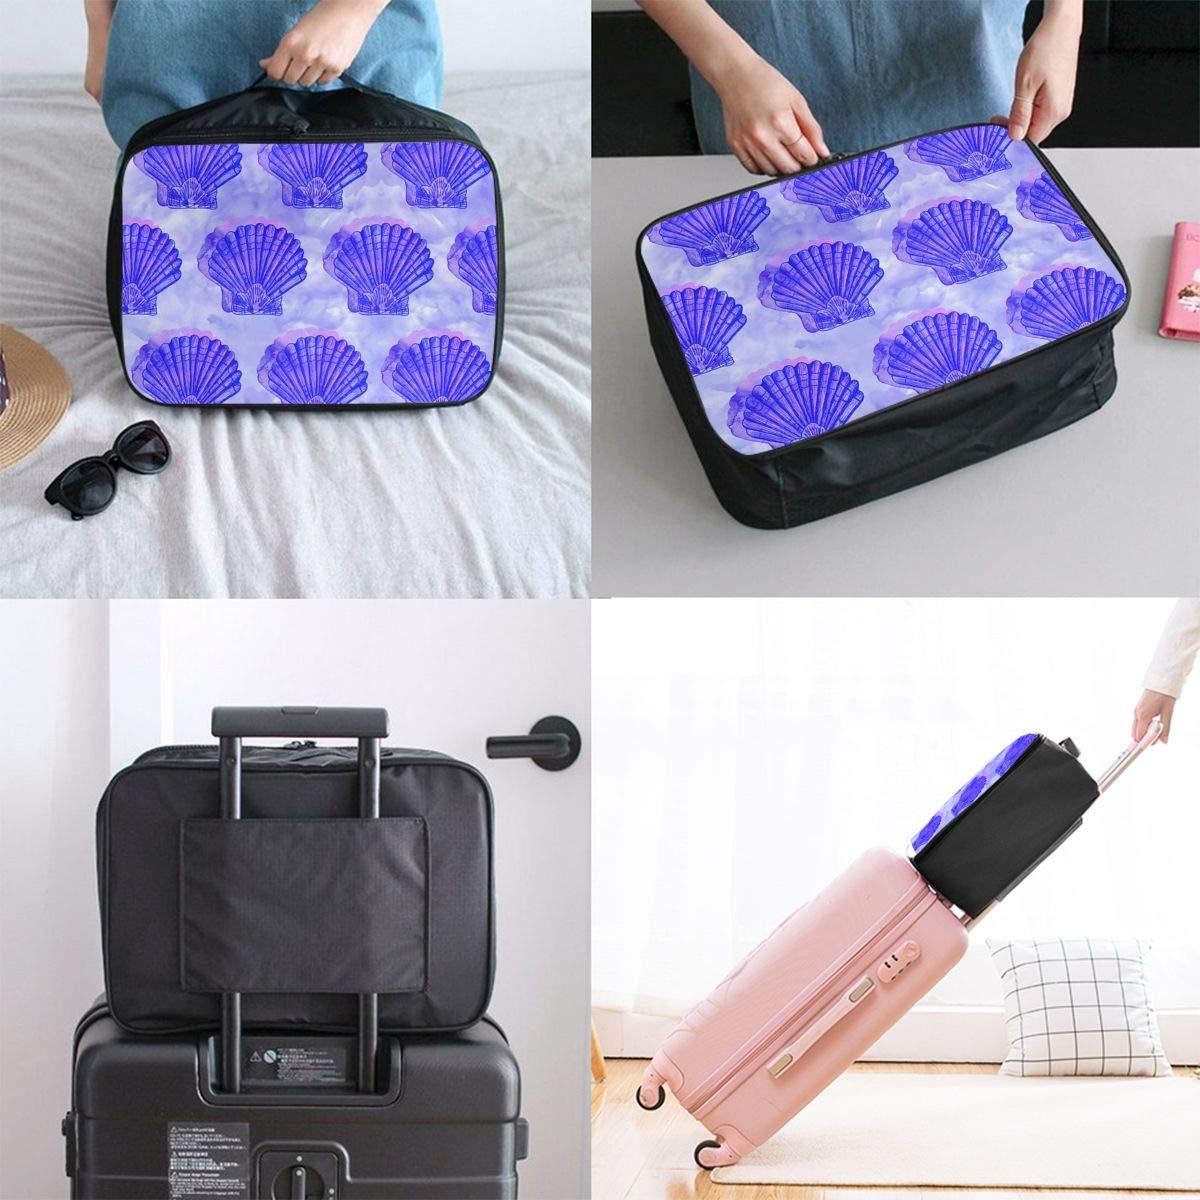 Travel Luggage Duffle Bag Lightweight Portable Handbag Purple Shell Pattern Large Capacity Waterproof Foldable Storage Tote